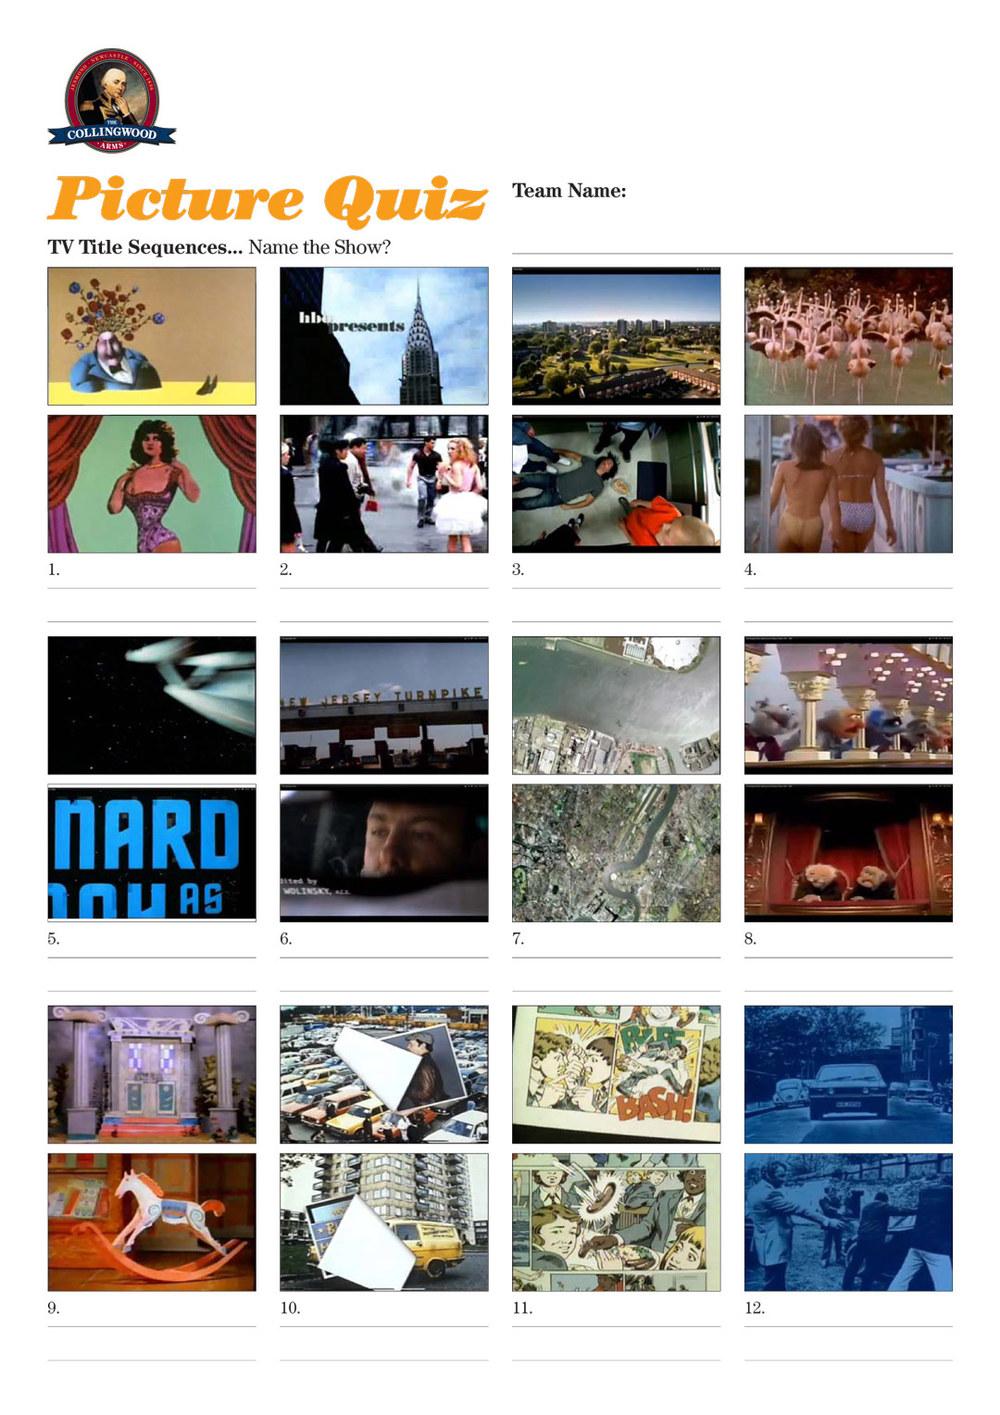 Film titles quiz answers : Angels friends film parte 1 ita